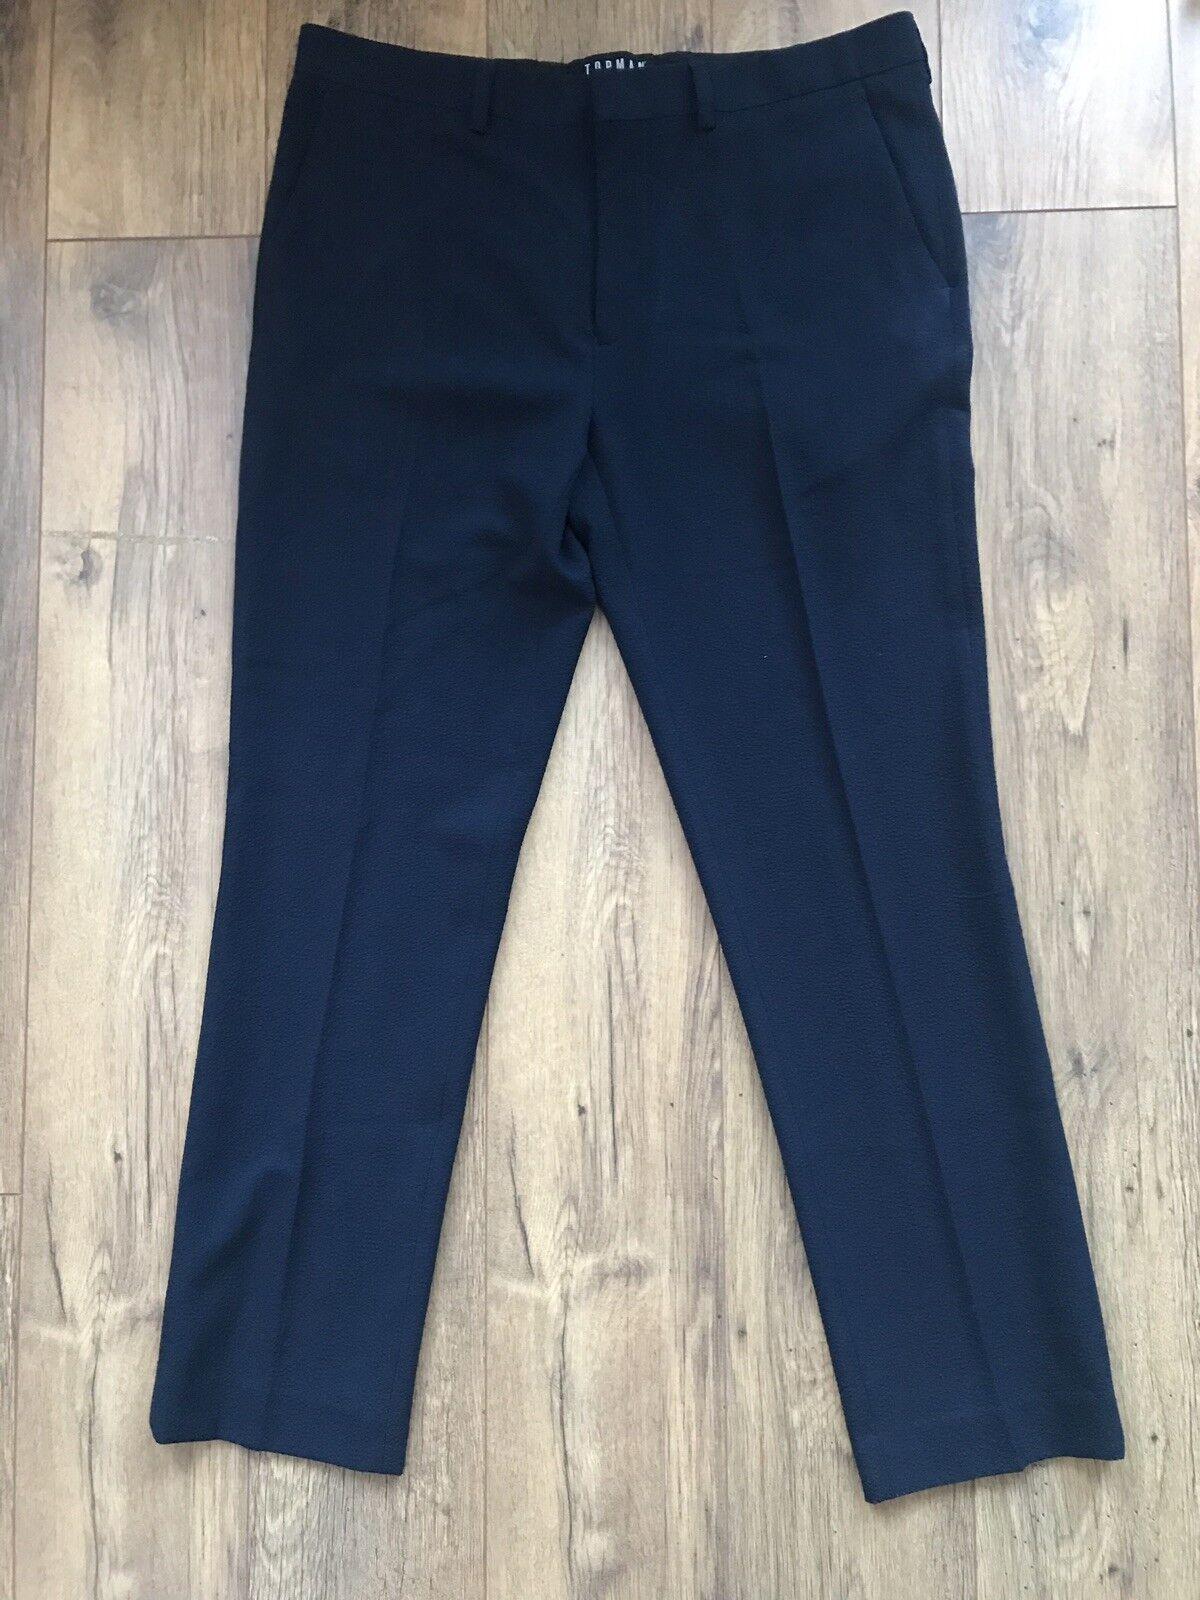 Topman Navy Trousers Size 34S